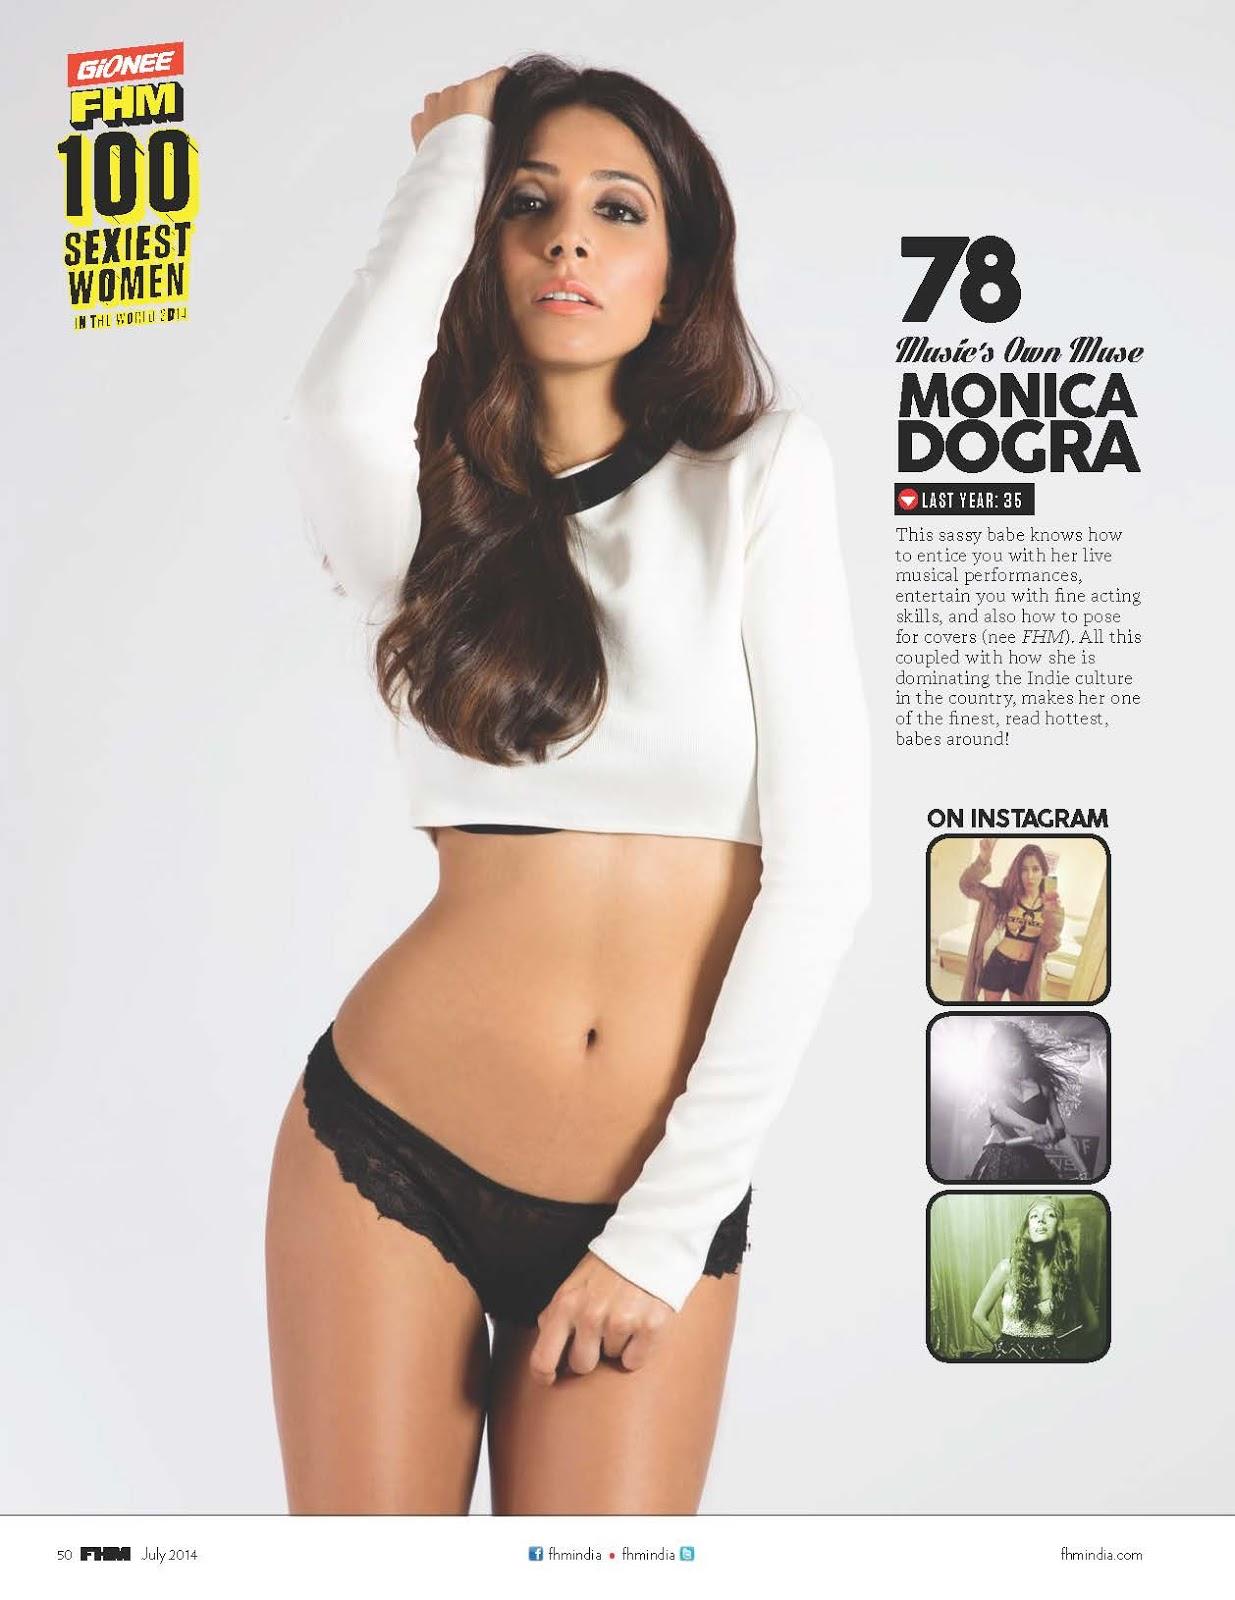 Sexy Monica doghra photo